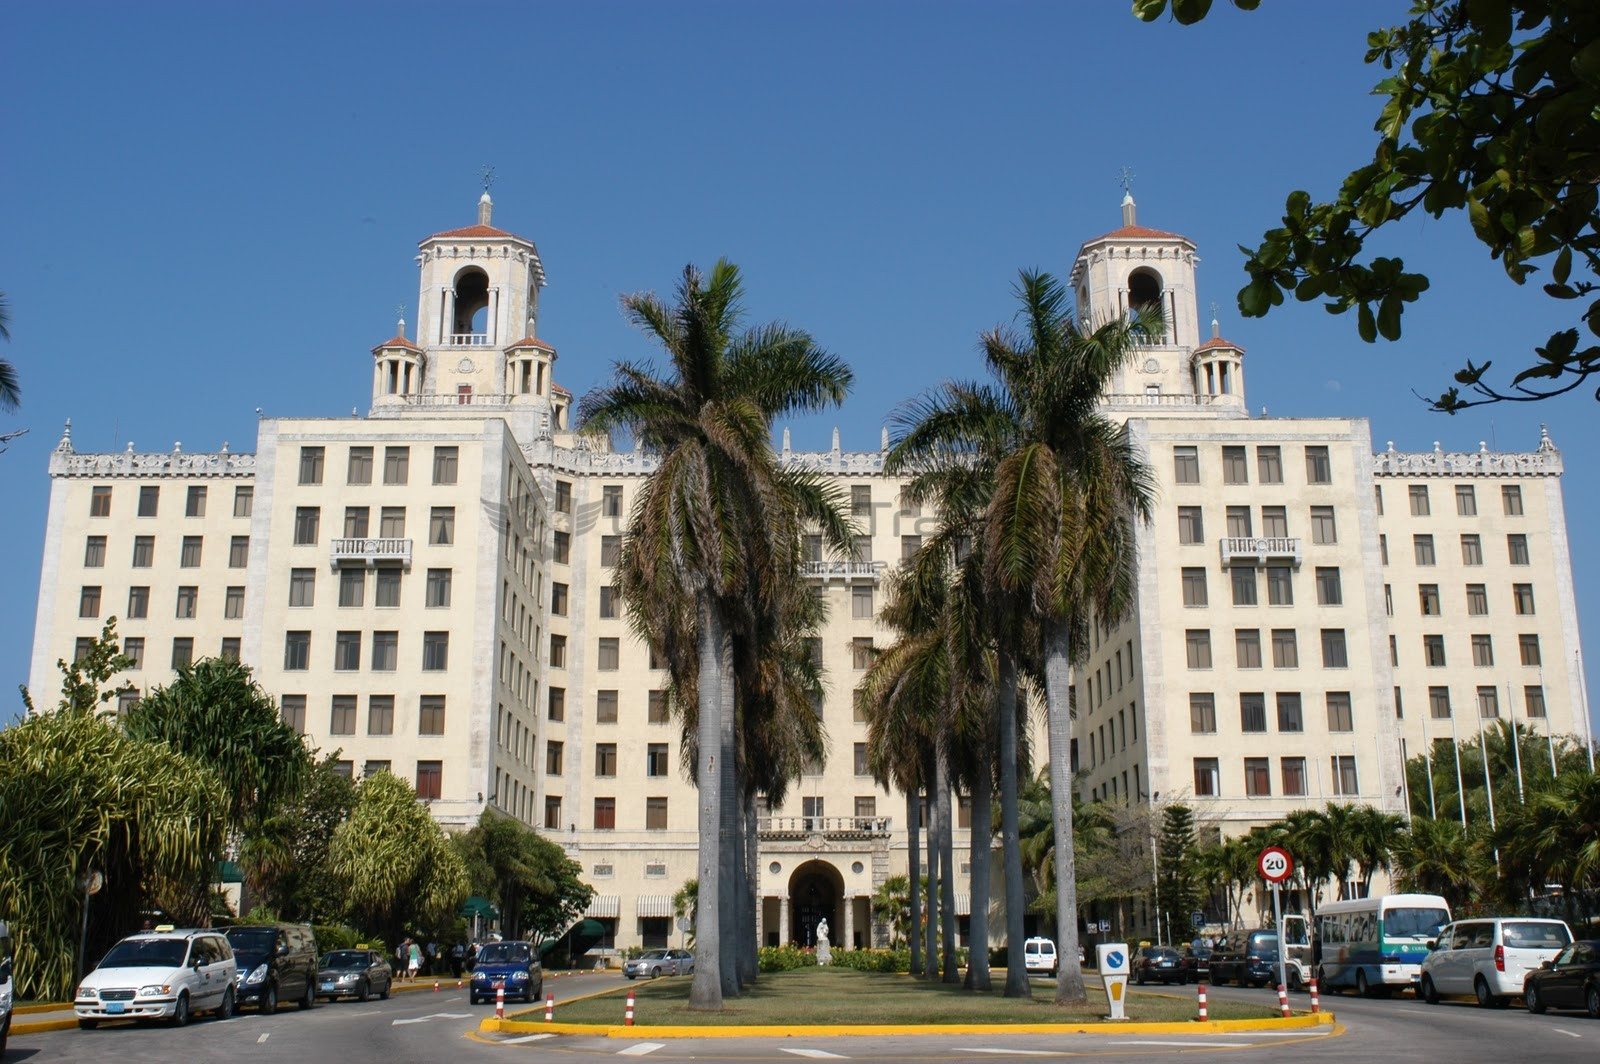 Hotel_Nacional_de_Cuba_Building_Exterior